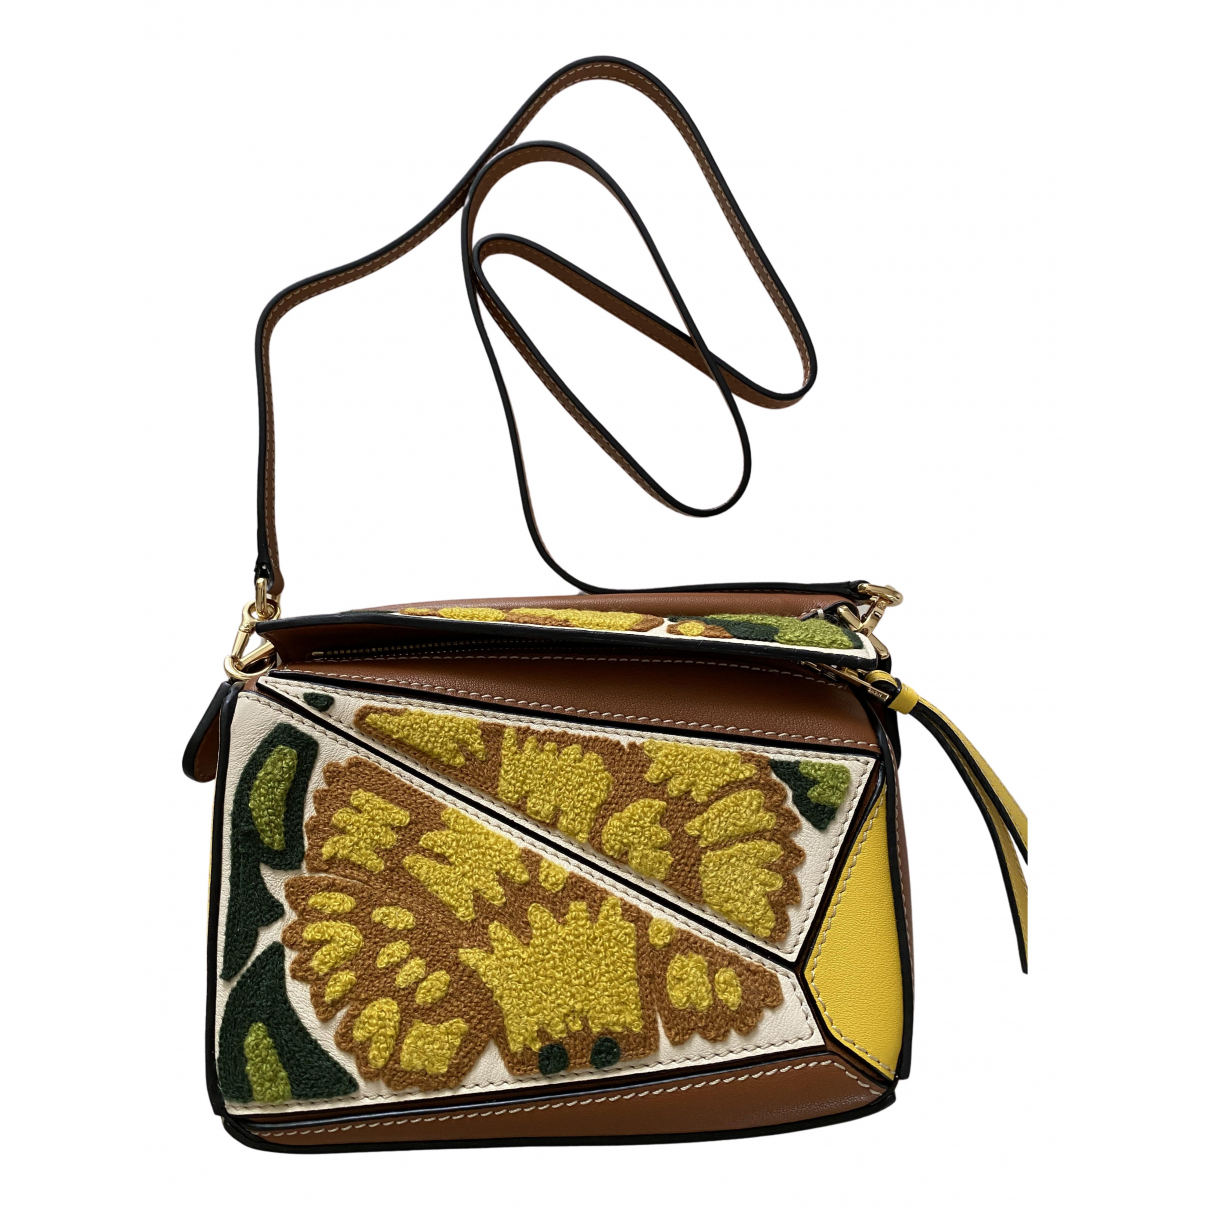 Loewe Puzzle  Multicolour Leather handbag for Women N